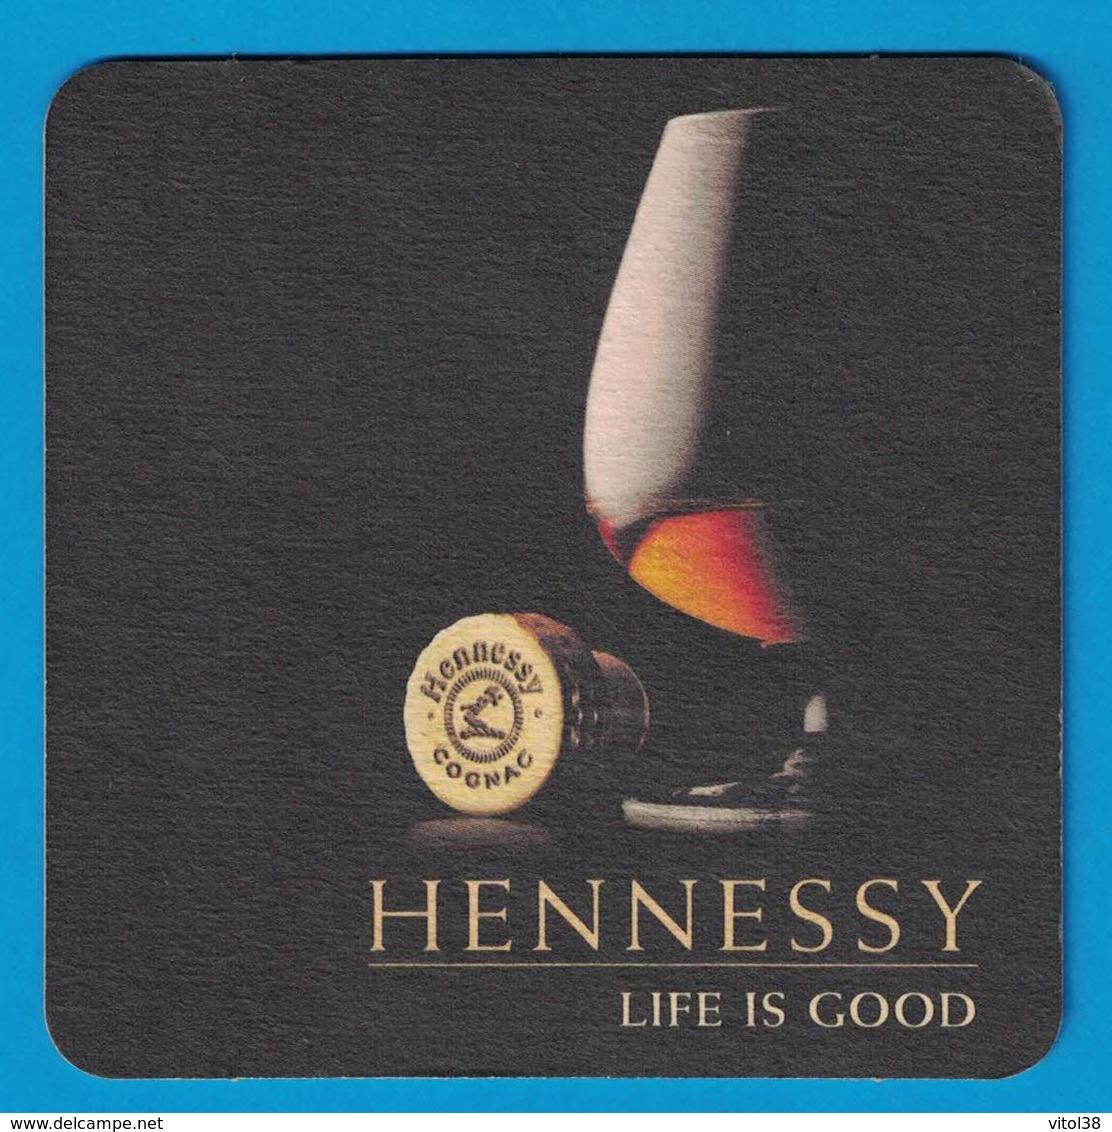 SOUS-BOCK HENNESSY COGNAC LIFE IS GOOD - Sous-bocks